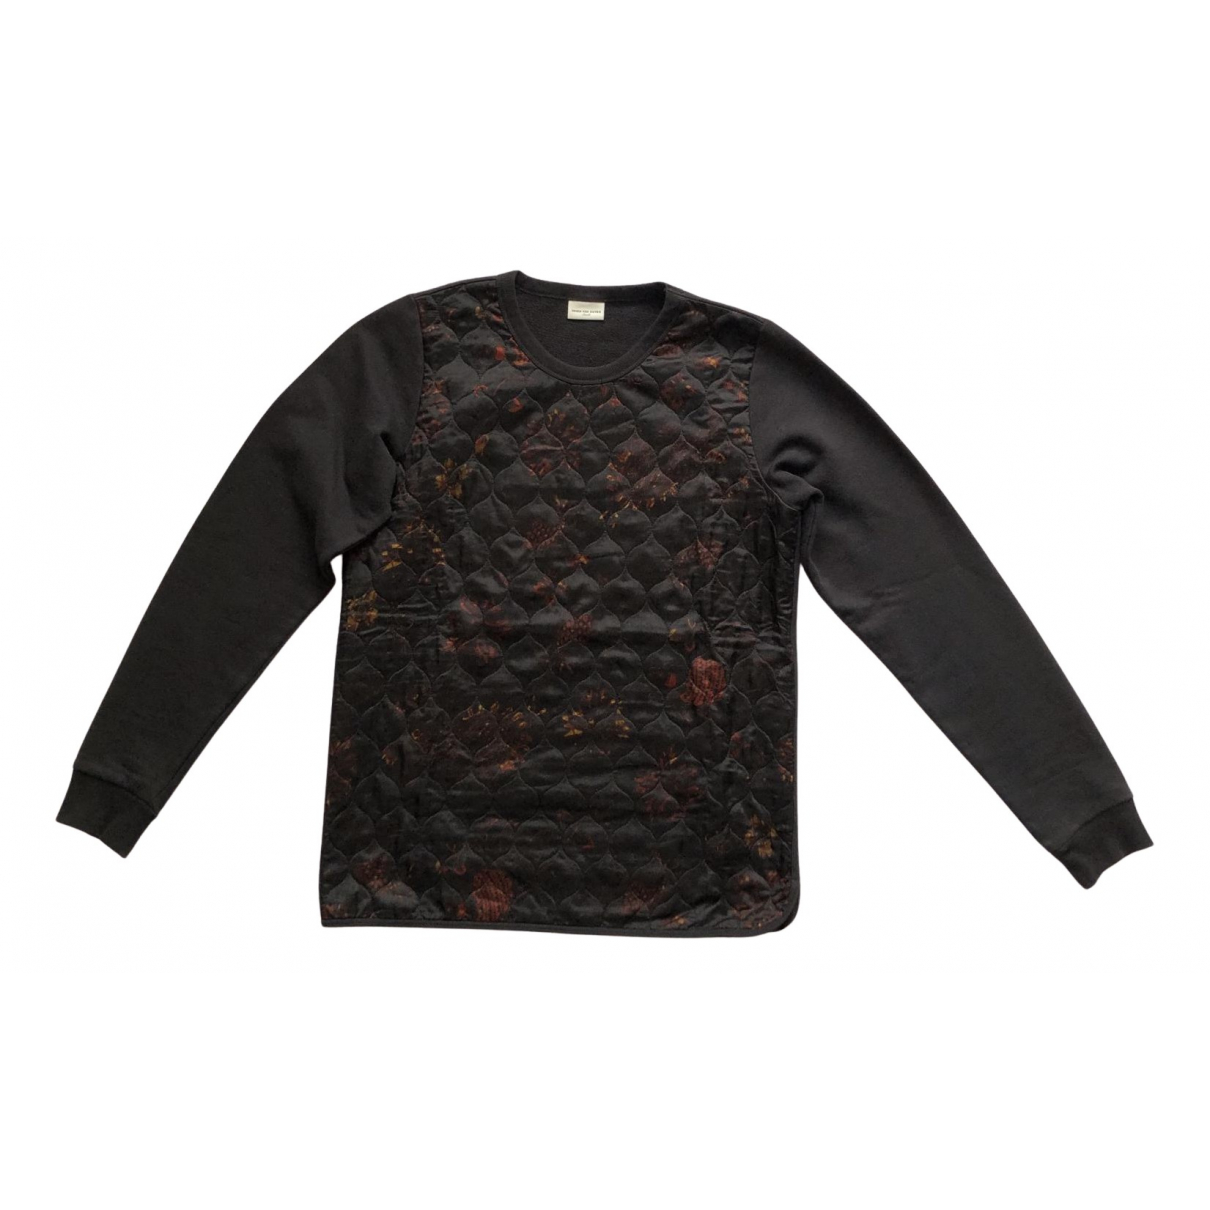 Dries Van Noten N Black Cotton Knitwear & Sweatshirts for Men S International